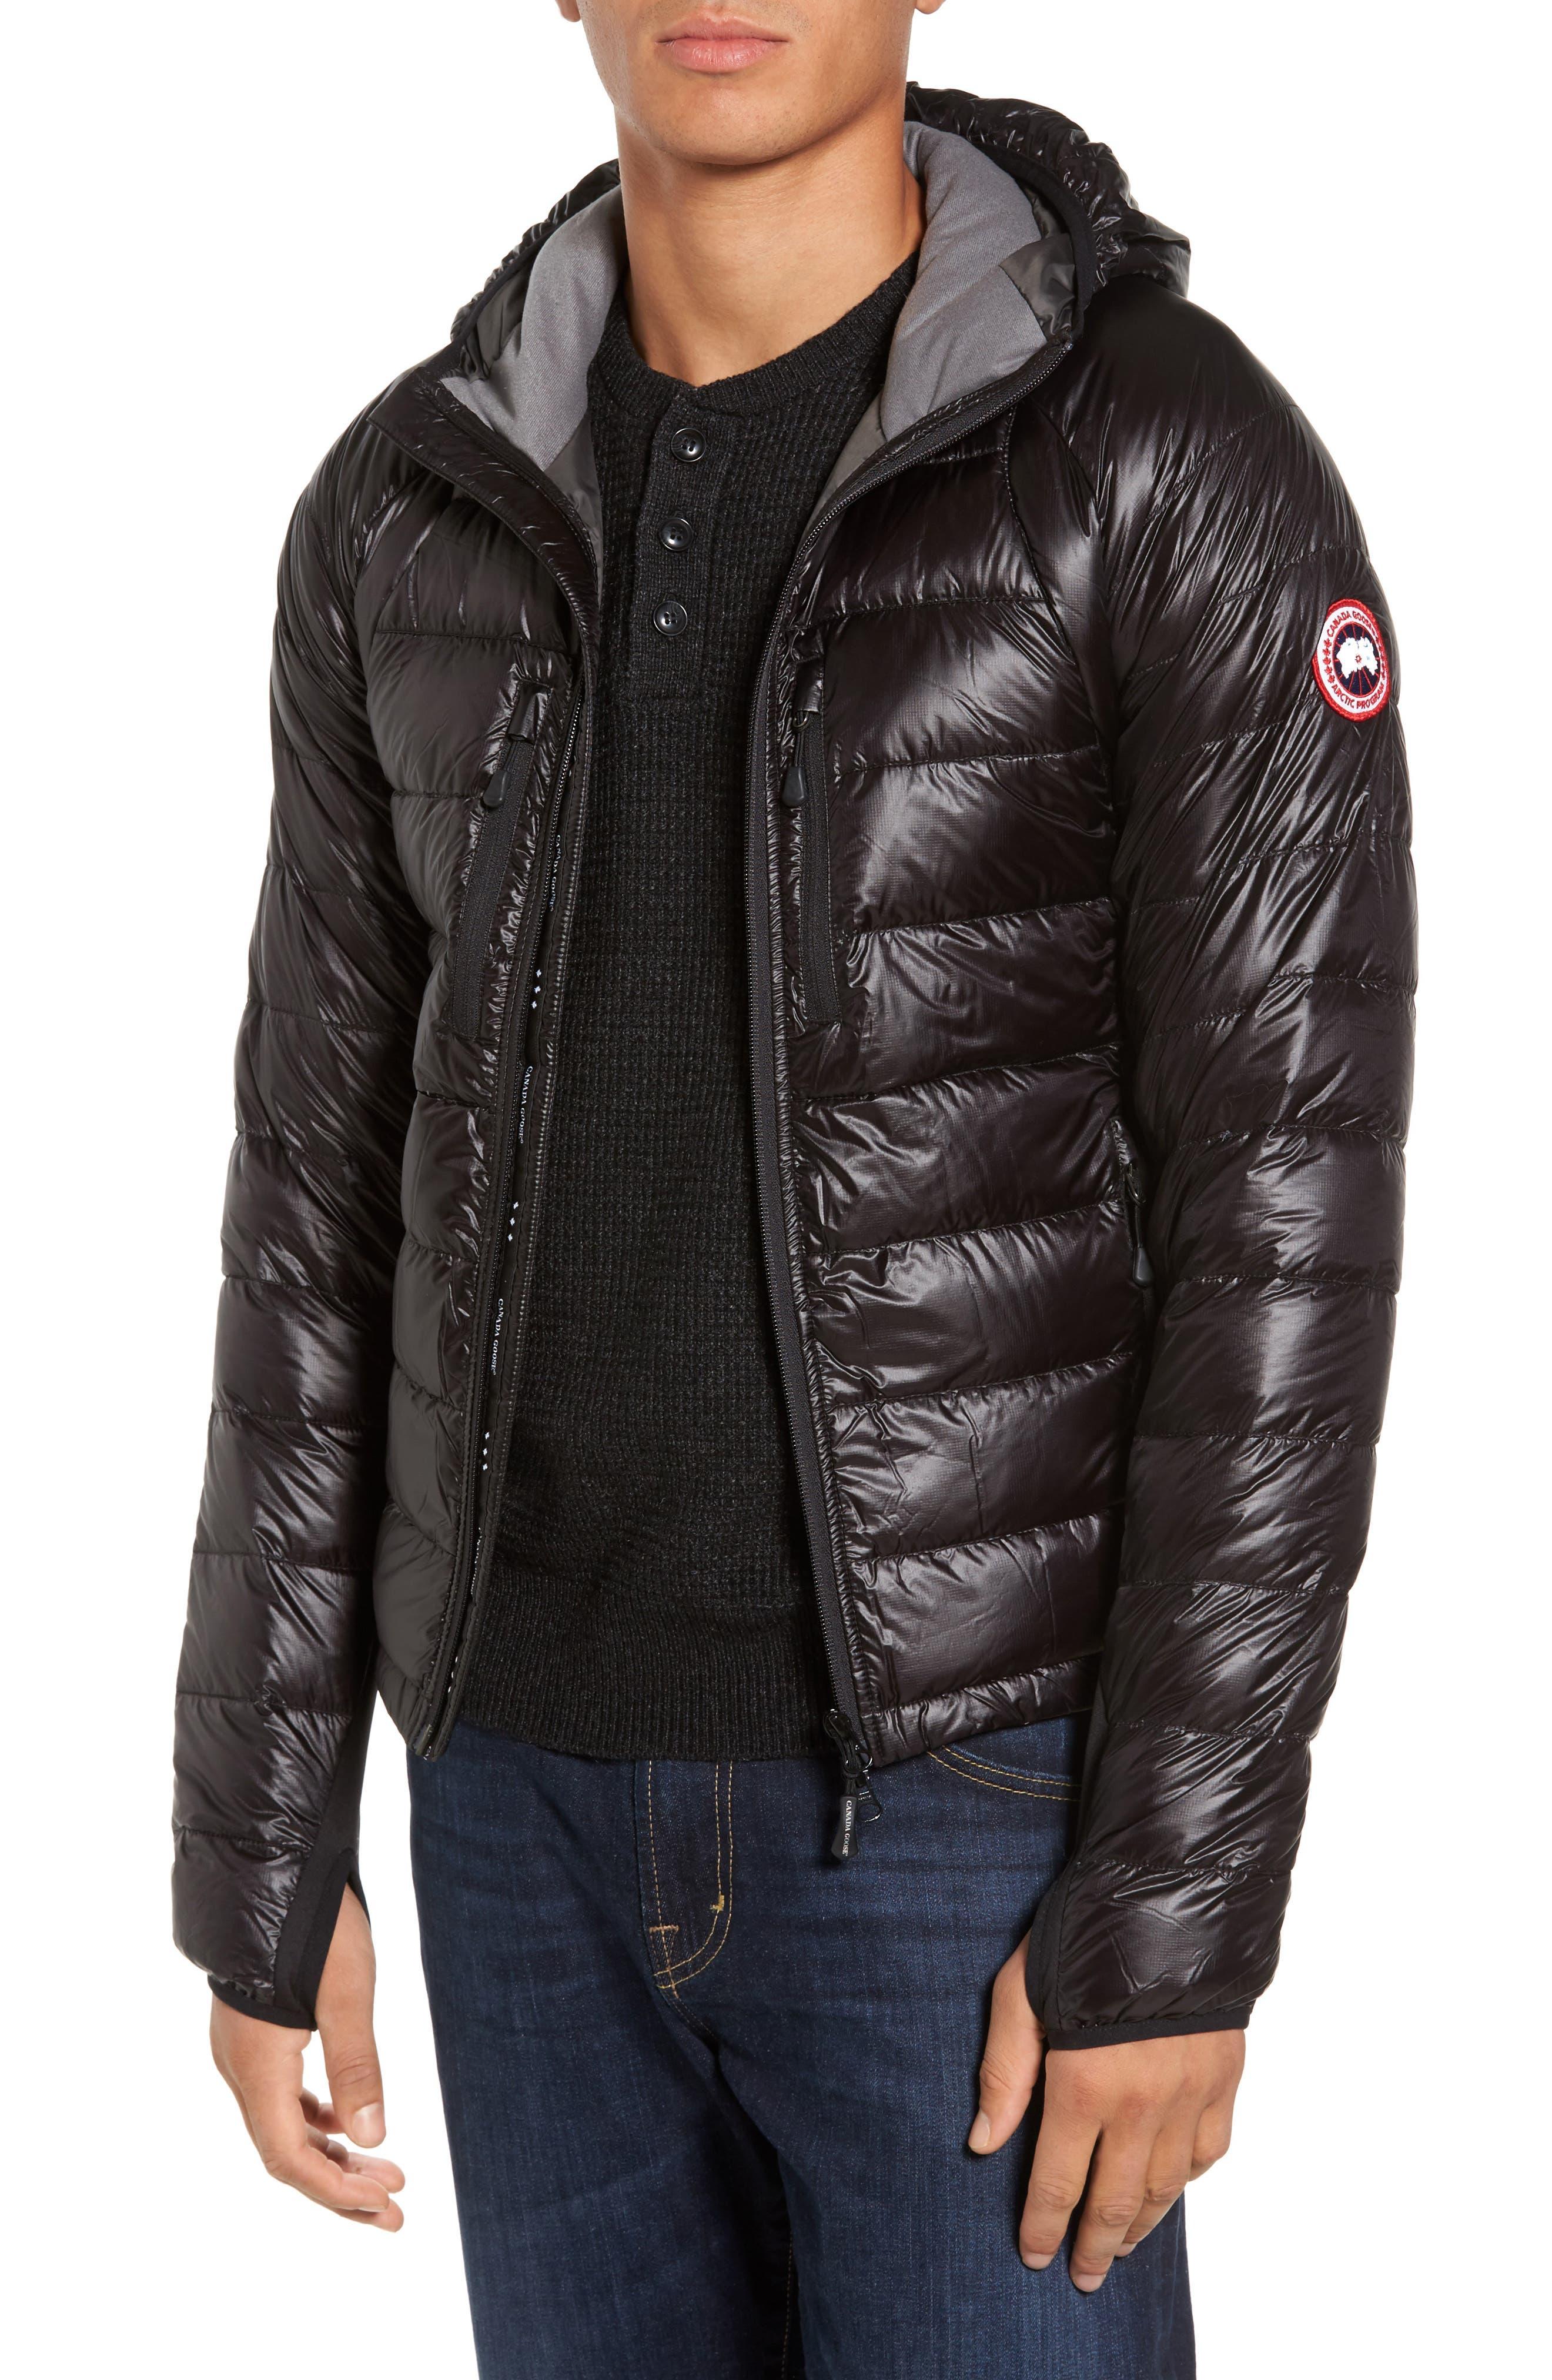 lauren outlet s ralph cotton mens sweatshirts price men sale clothing hoodies wholesale polo aviator navy jacket quilted quilt online estate aviatornavy specials hoodie rib